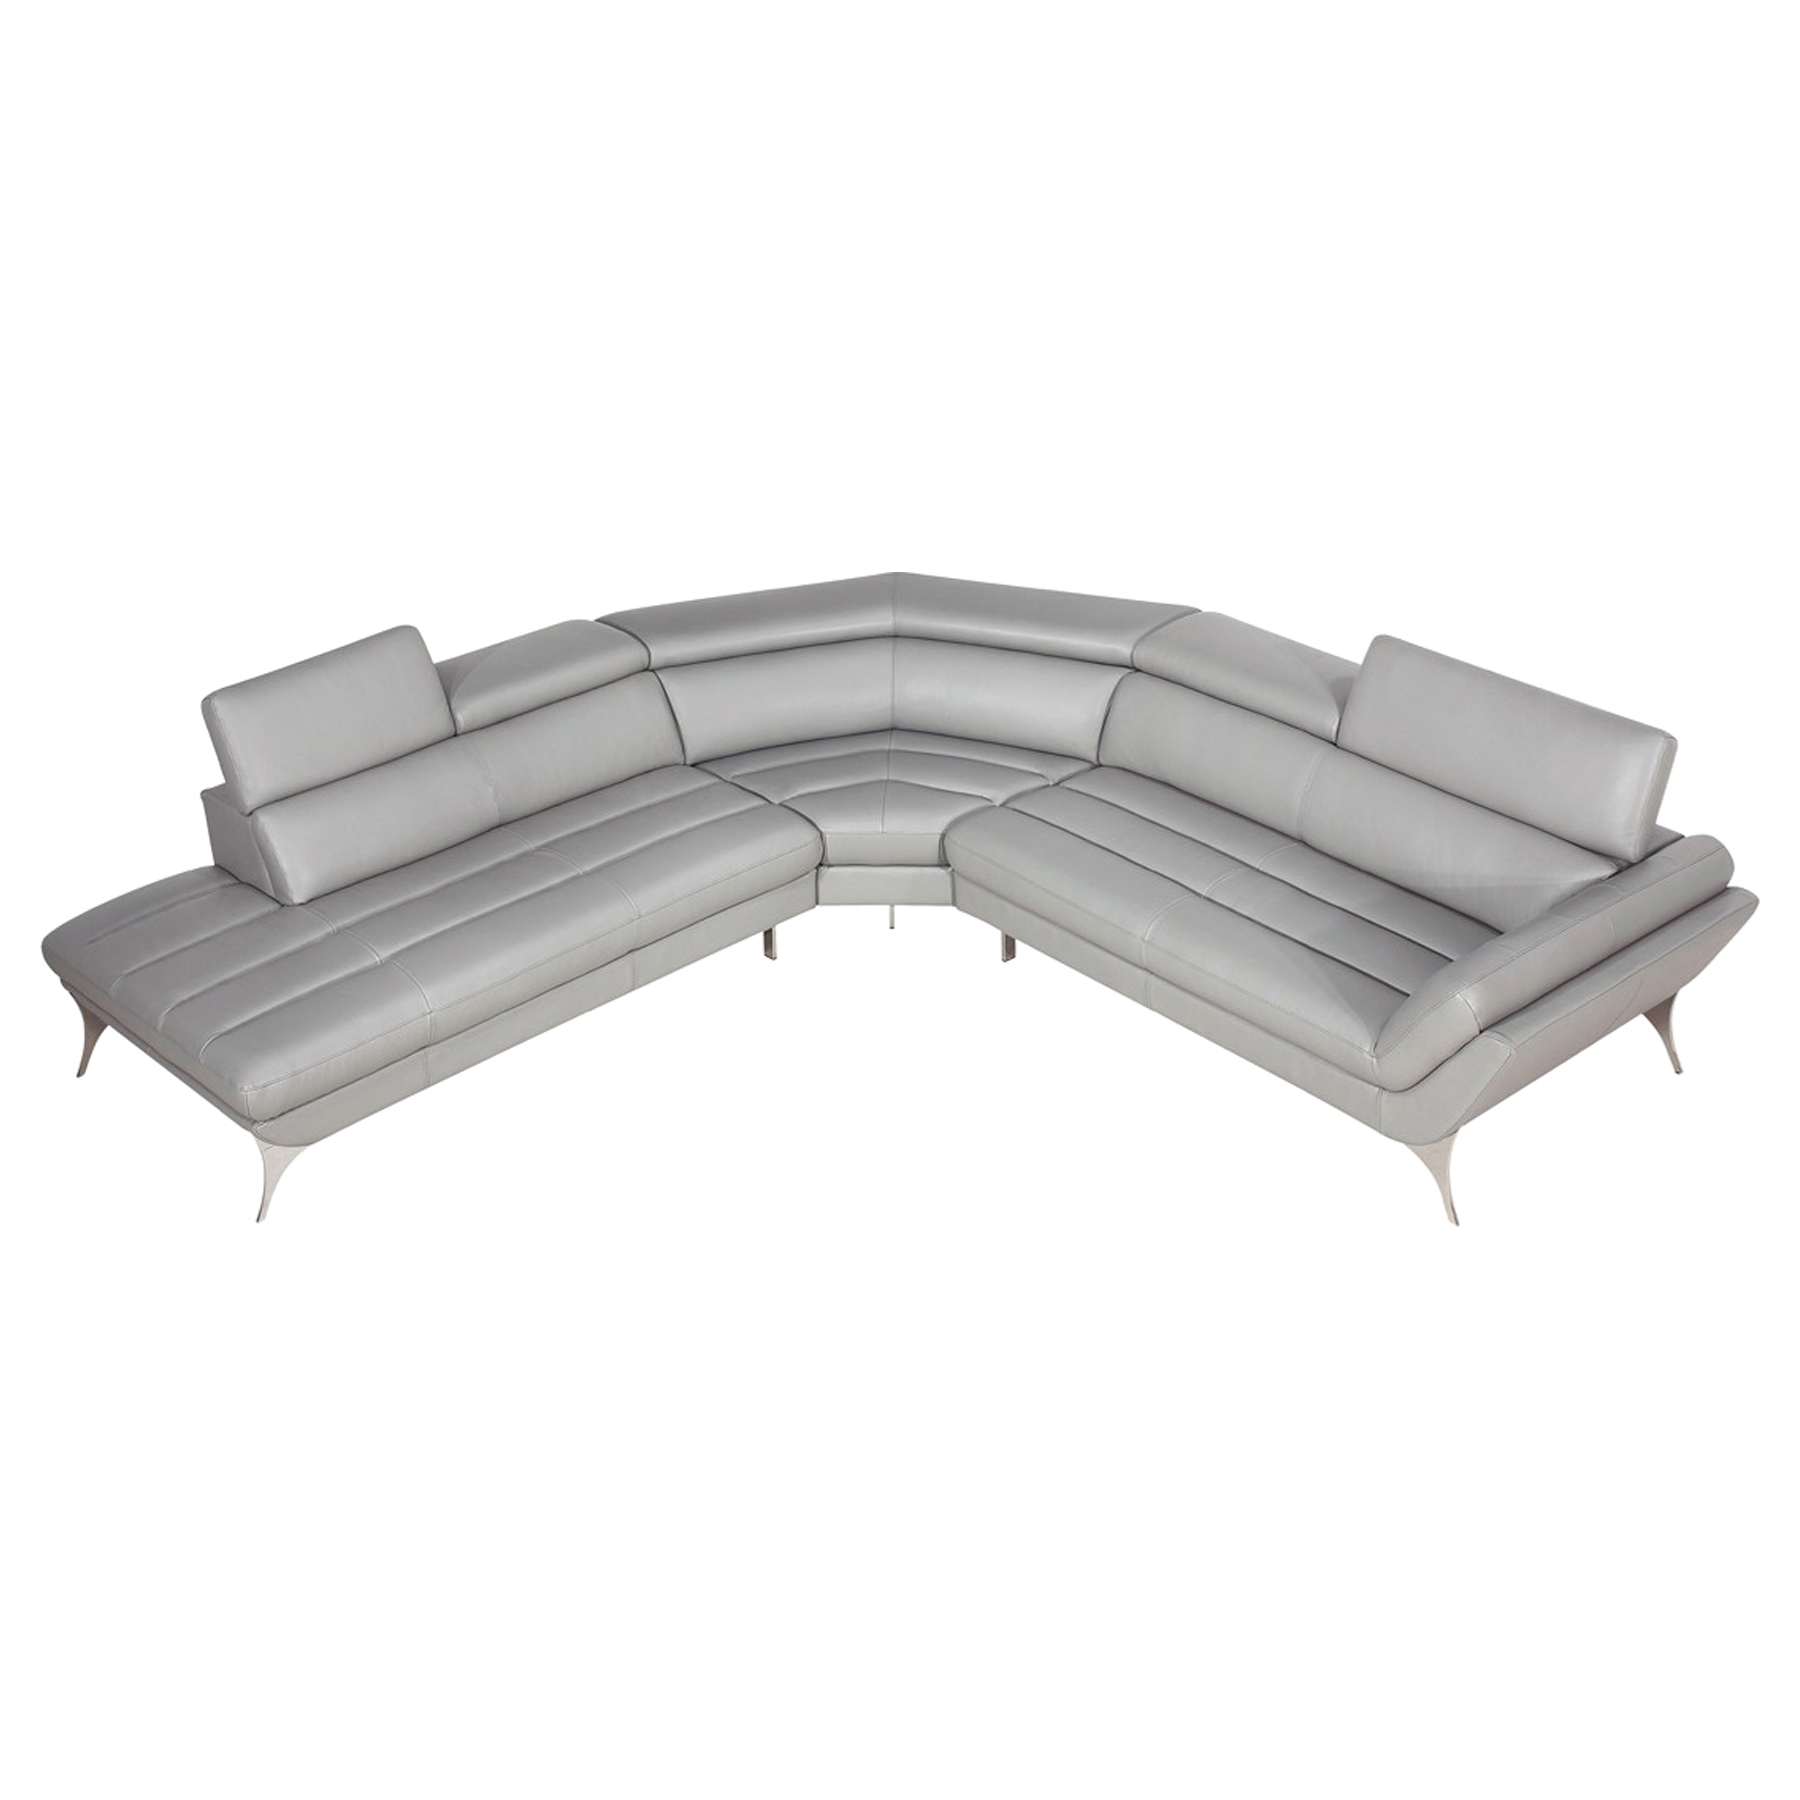 Divani Casa Graphite Sectional Sofa   Gray   VIG VGCA1541 GRY ...